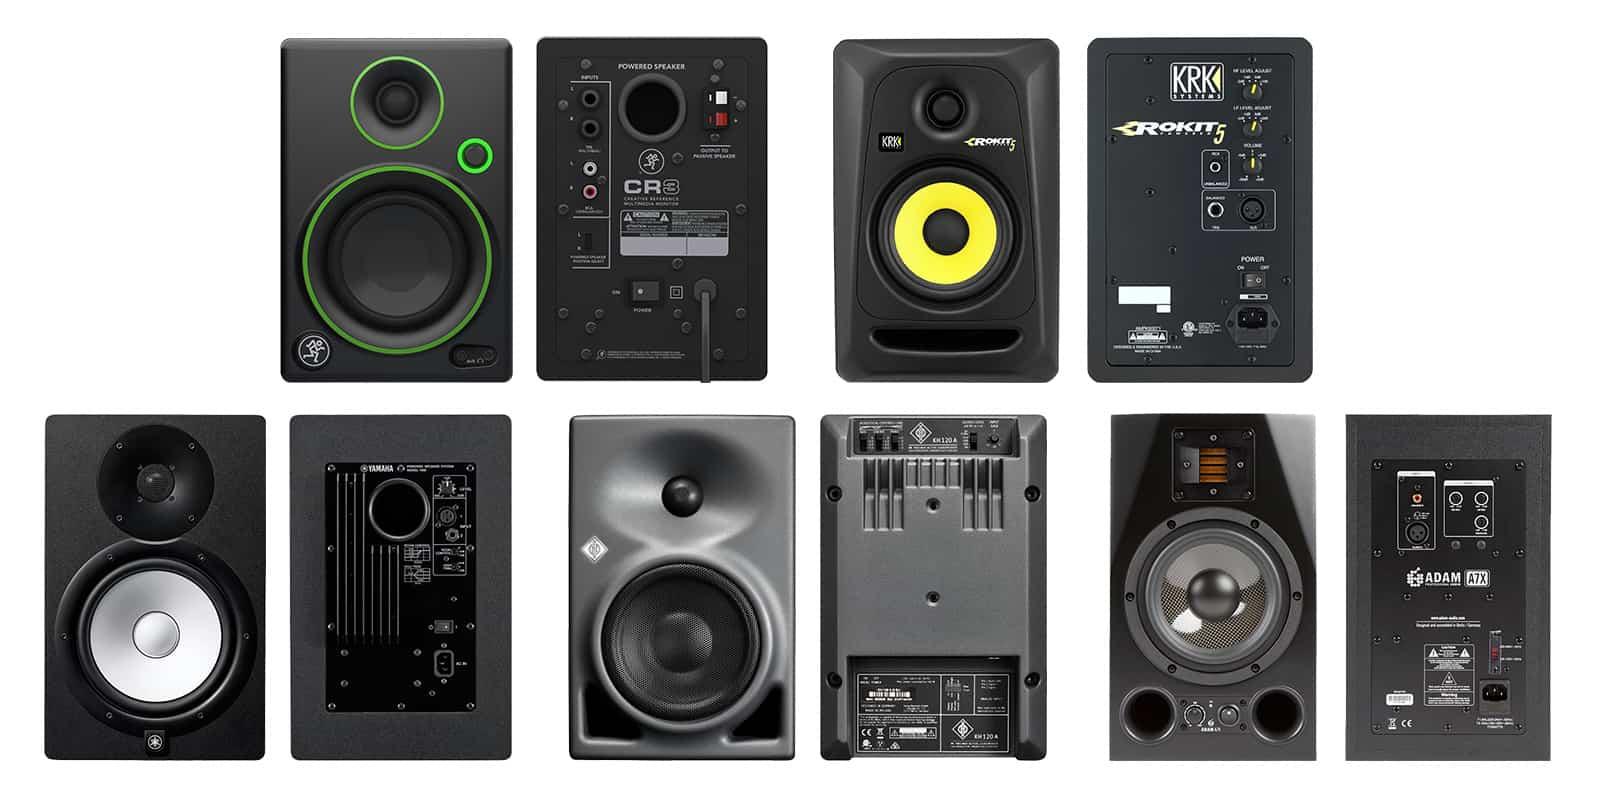 Studio Monitor Speaker Market is Booming Worldwide | JBL, Ahuja Radios, Philips, Bose, Sony